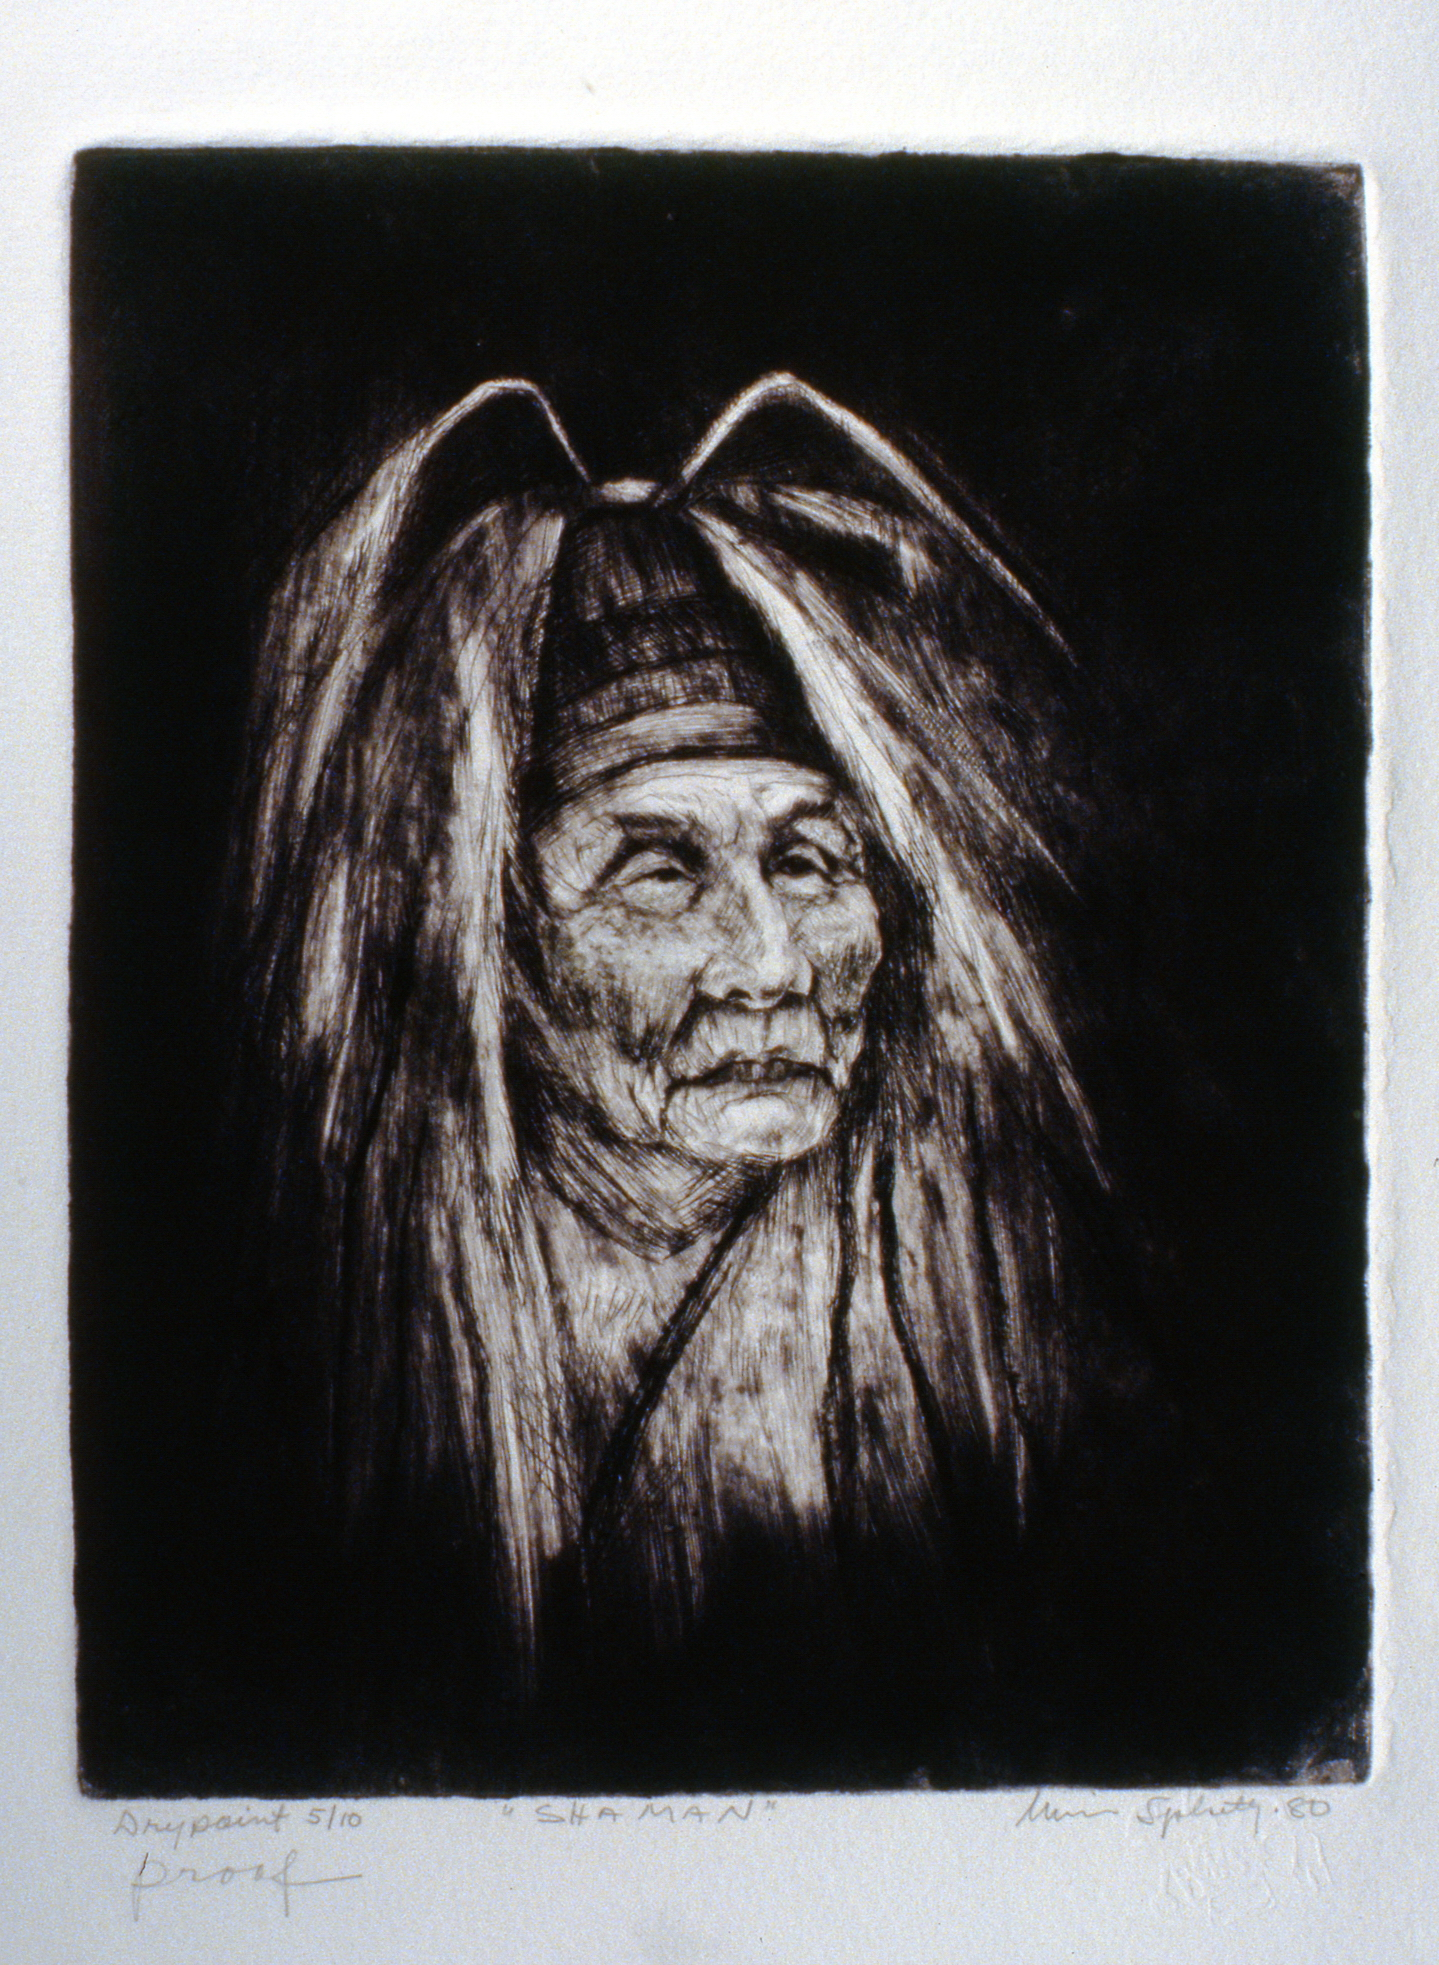 Shaman , 1980, Minn Sjølseth, artist proof marked 5/10, 25 x 20 cm, 1996.02.12